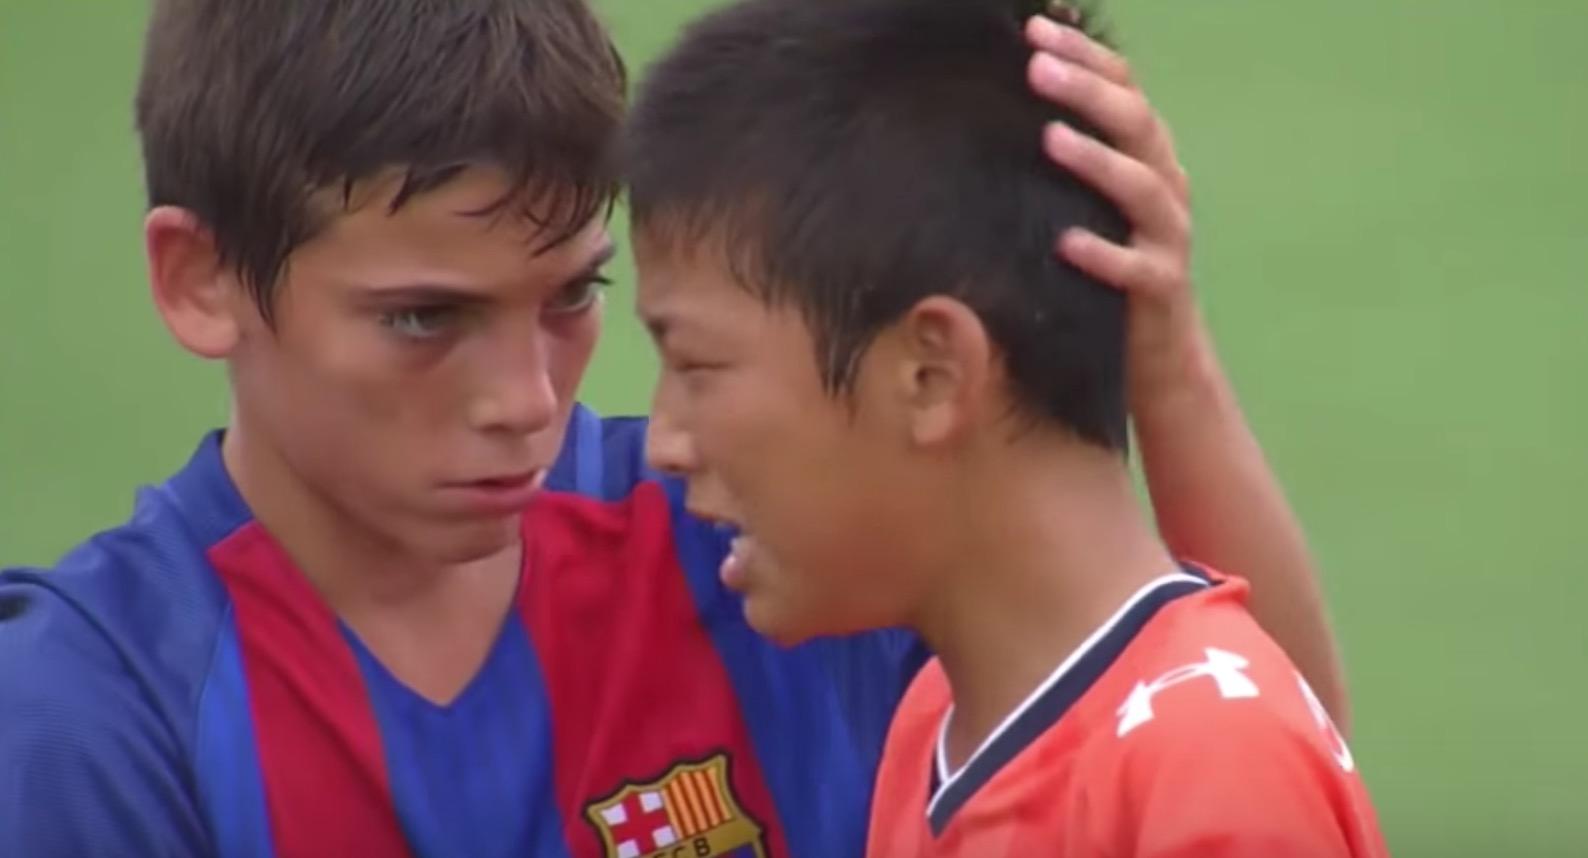 【U-12】敗北の悔しさに涙する日本選手たち。それを見たバルセロナ選手たちのスポーツマンシップが素晴らしいと話題に!!